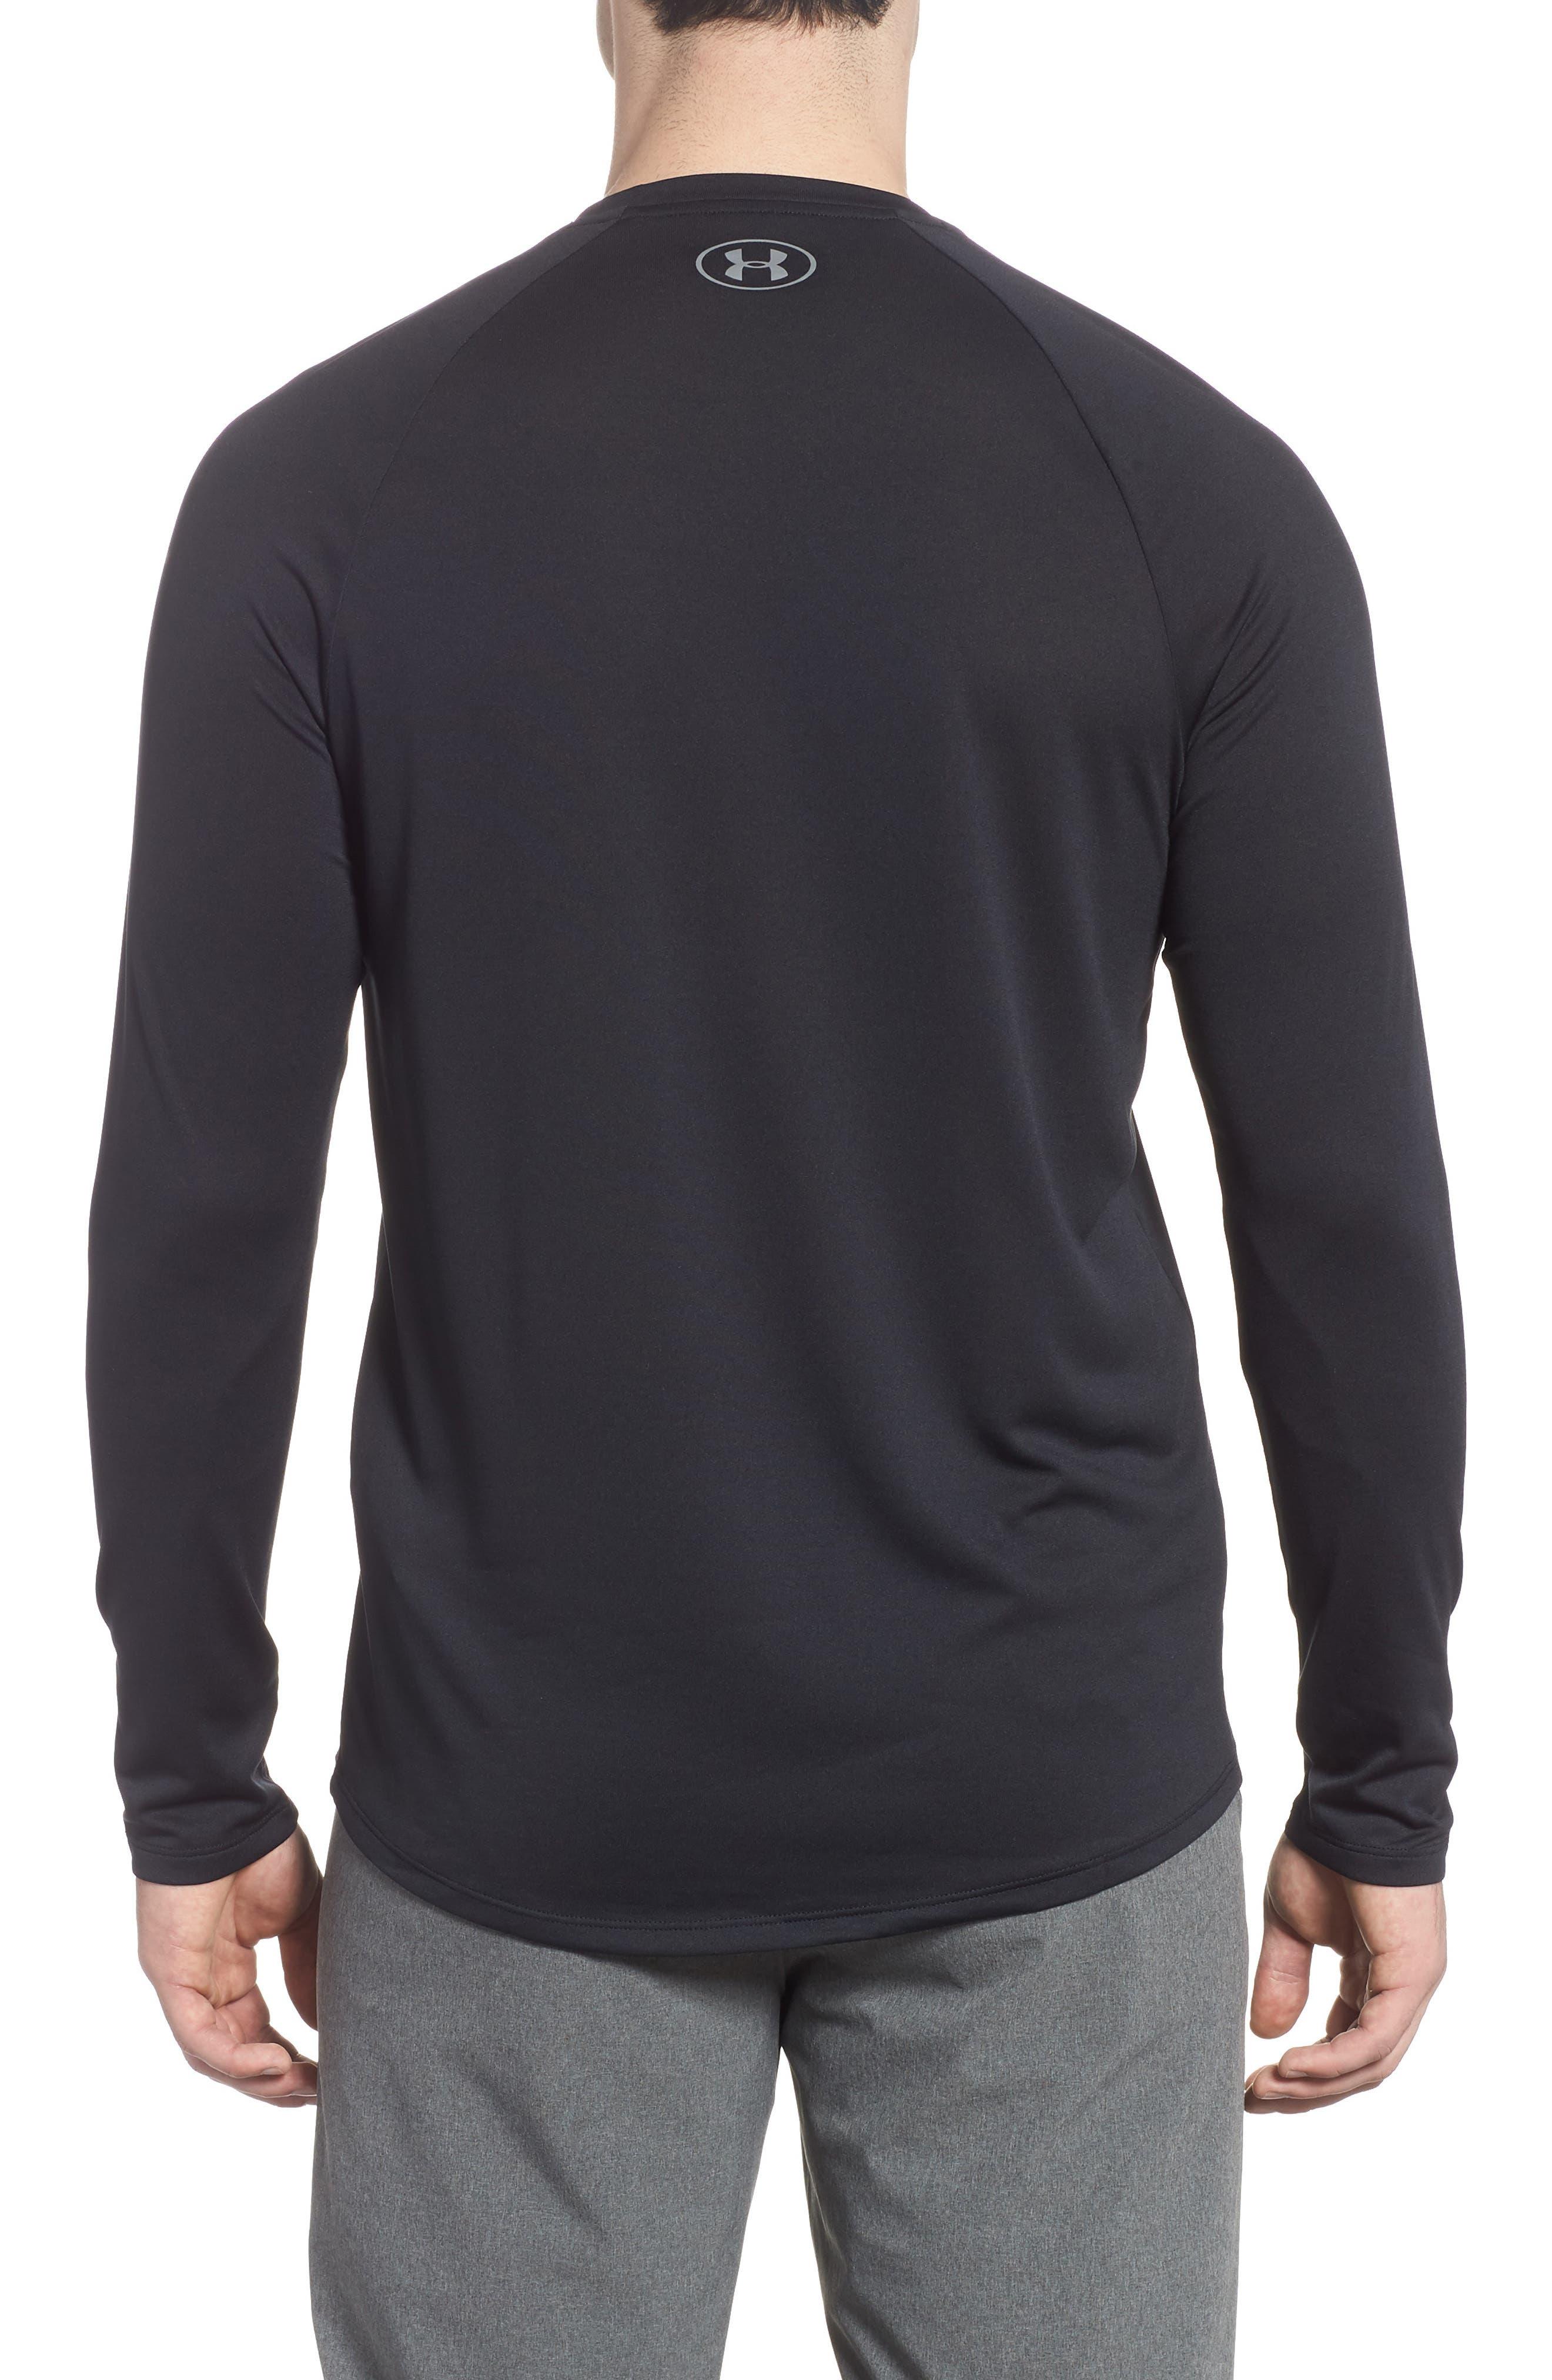 Performance Tech Long Sleeve Shirt,                             Alternate thumbnail 2, color,                             BLACK/ STEEL